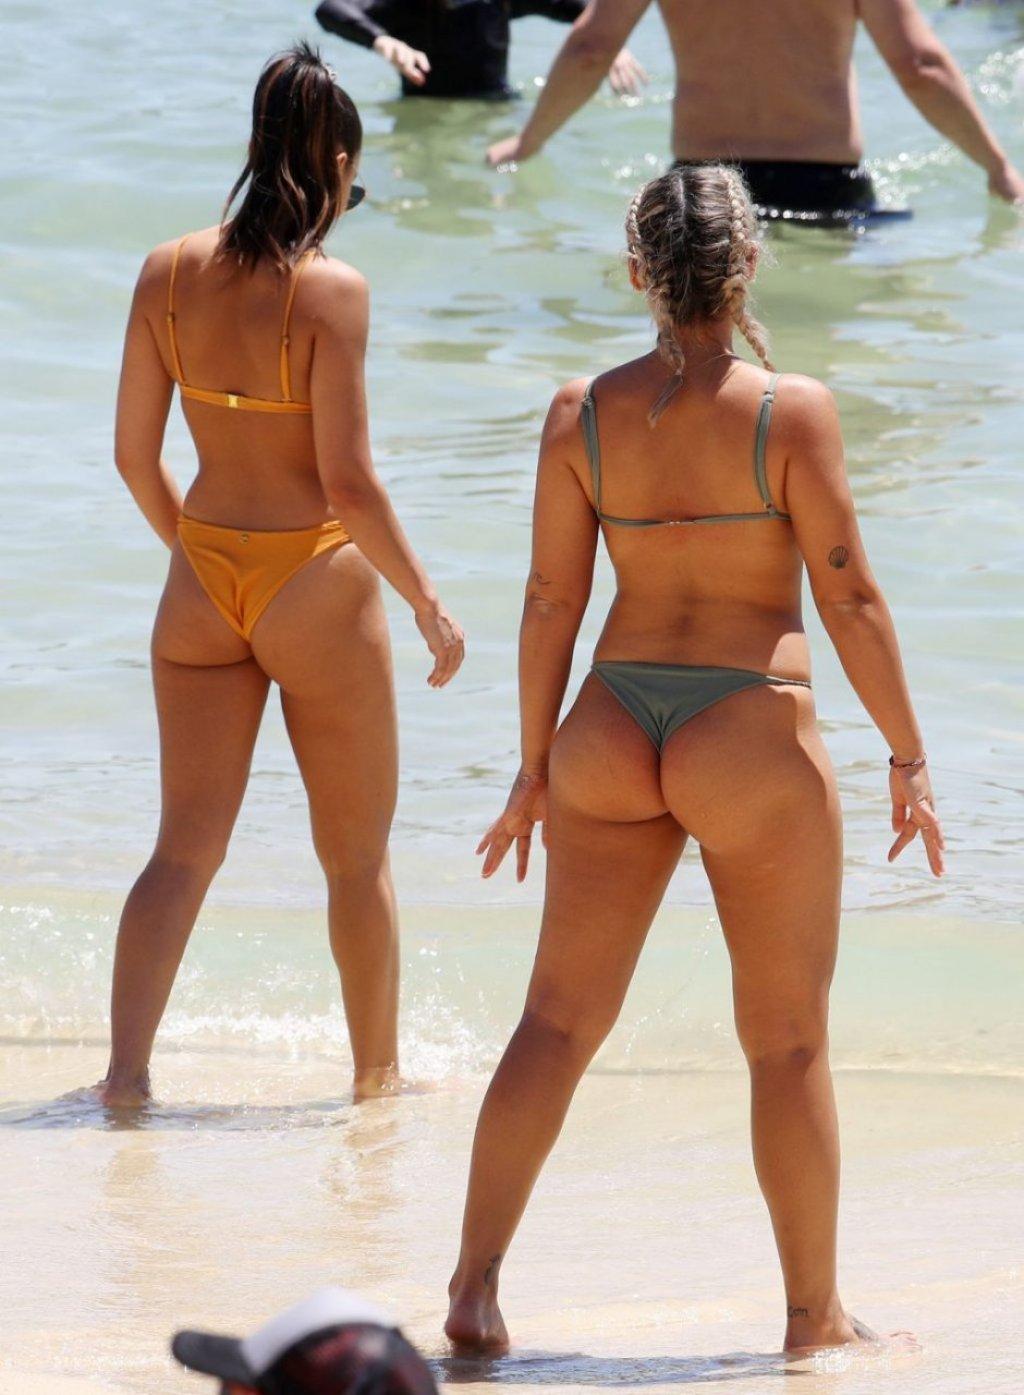 Noni Janur & Tayla Damir Sexy (54 Photos)